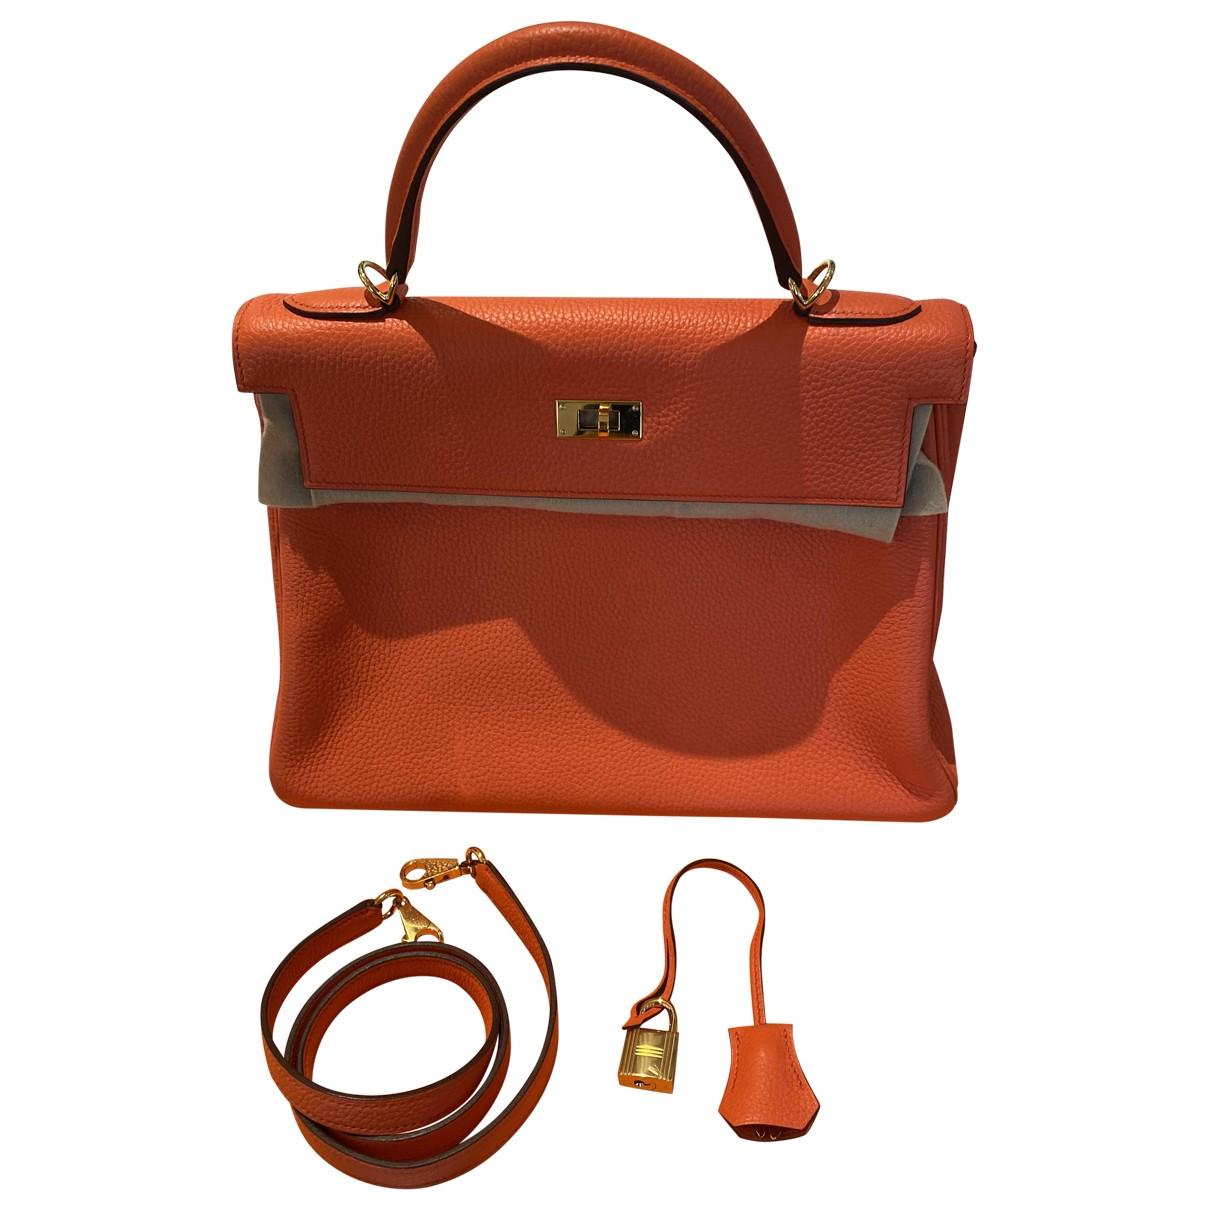 Hermes - Sac a main Kelly 32 pour femme en cuir - orange